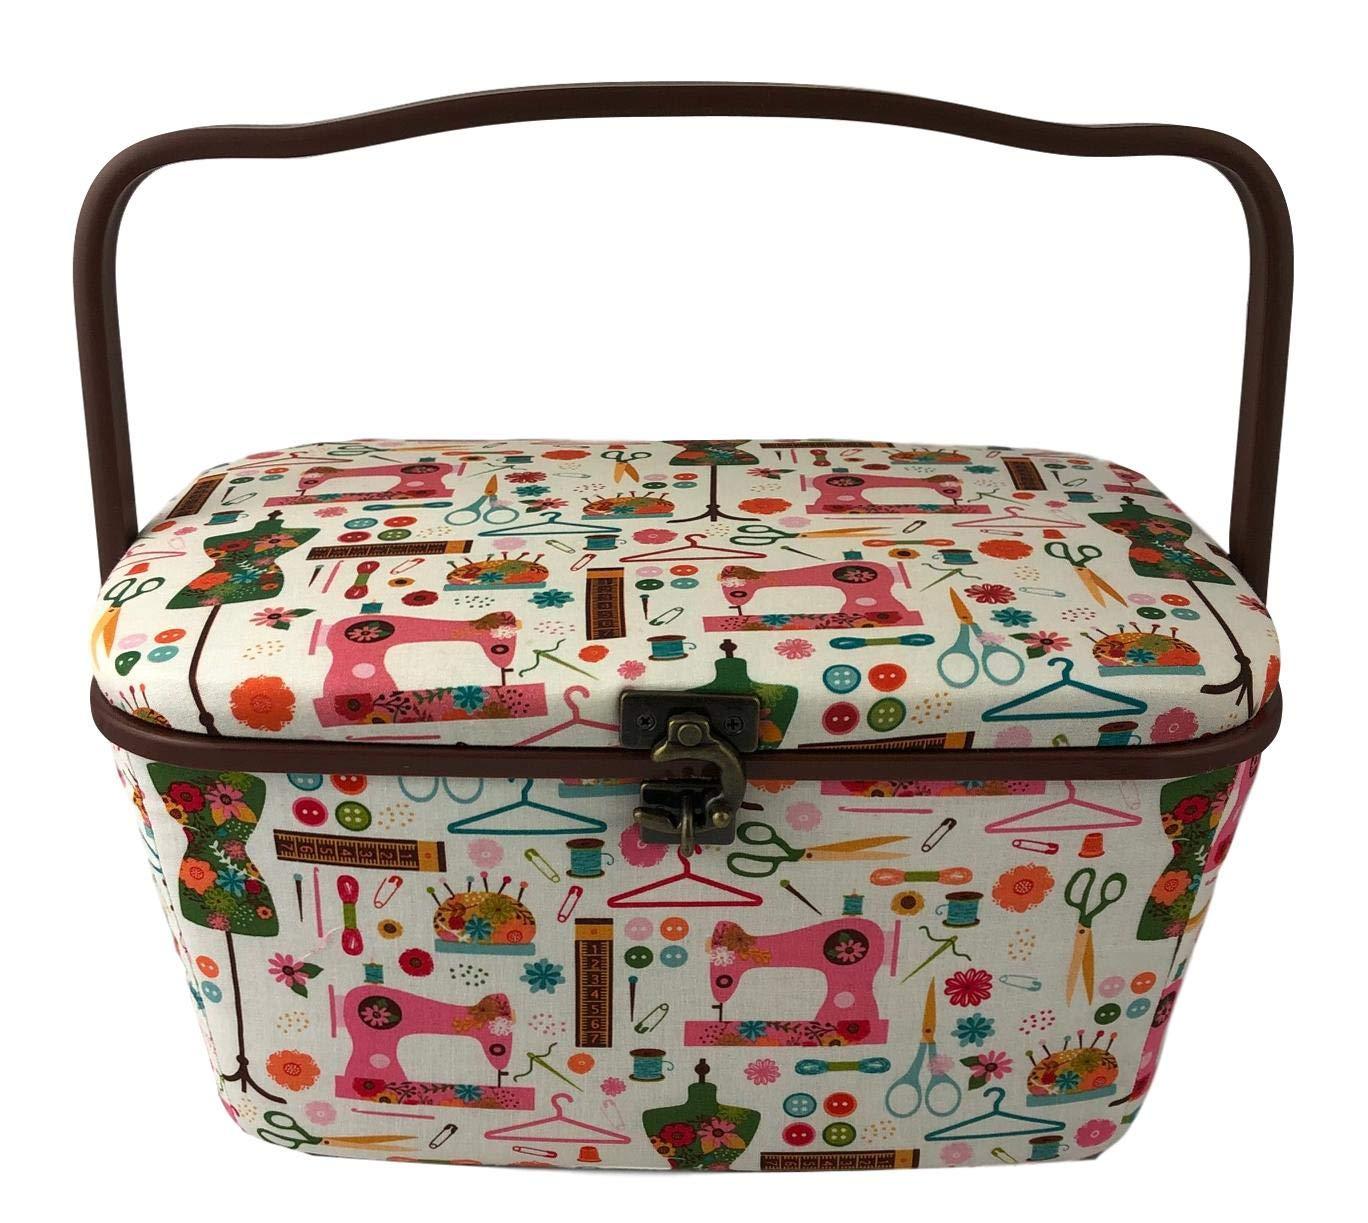 Medium 11x7x6.5, Beige with White Flowers Medium Rectangle Sewing Basket Box with Tray Pincushion 11x7x6.5